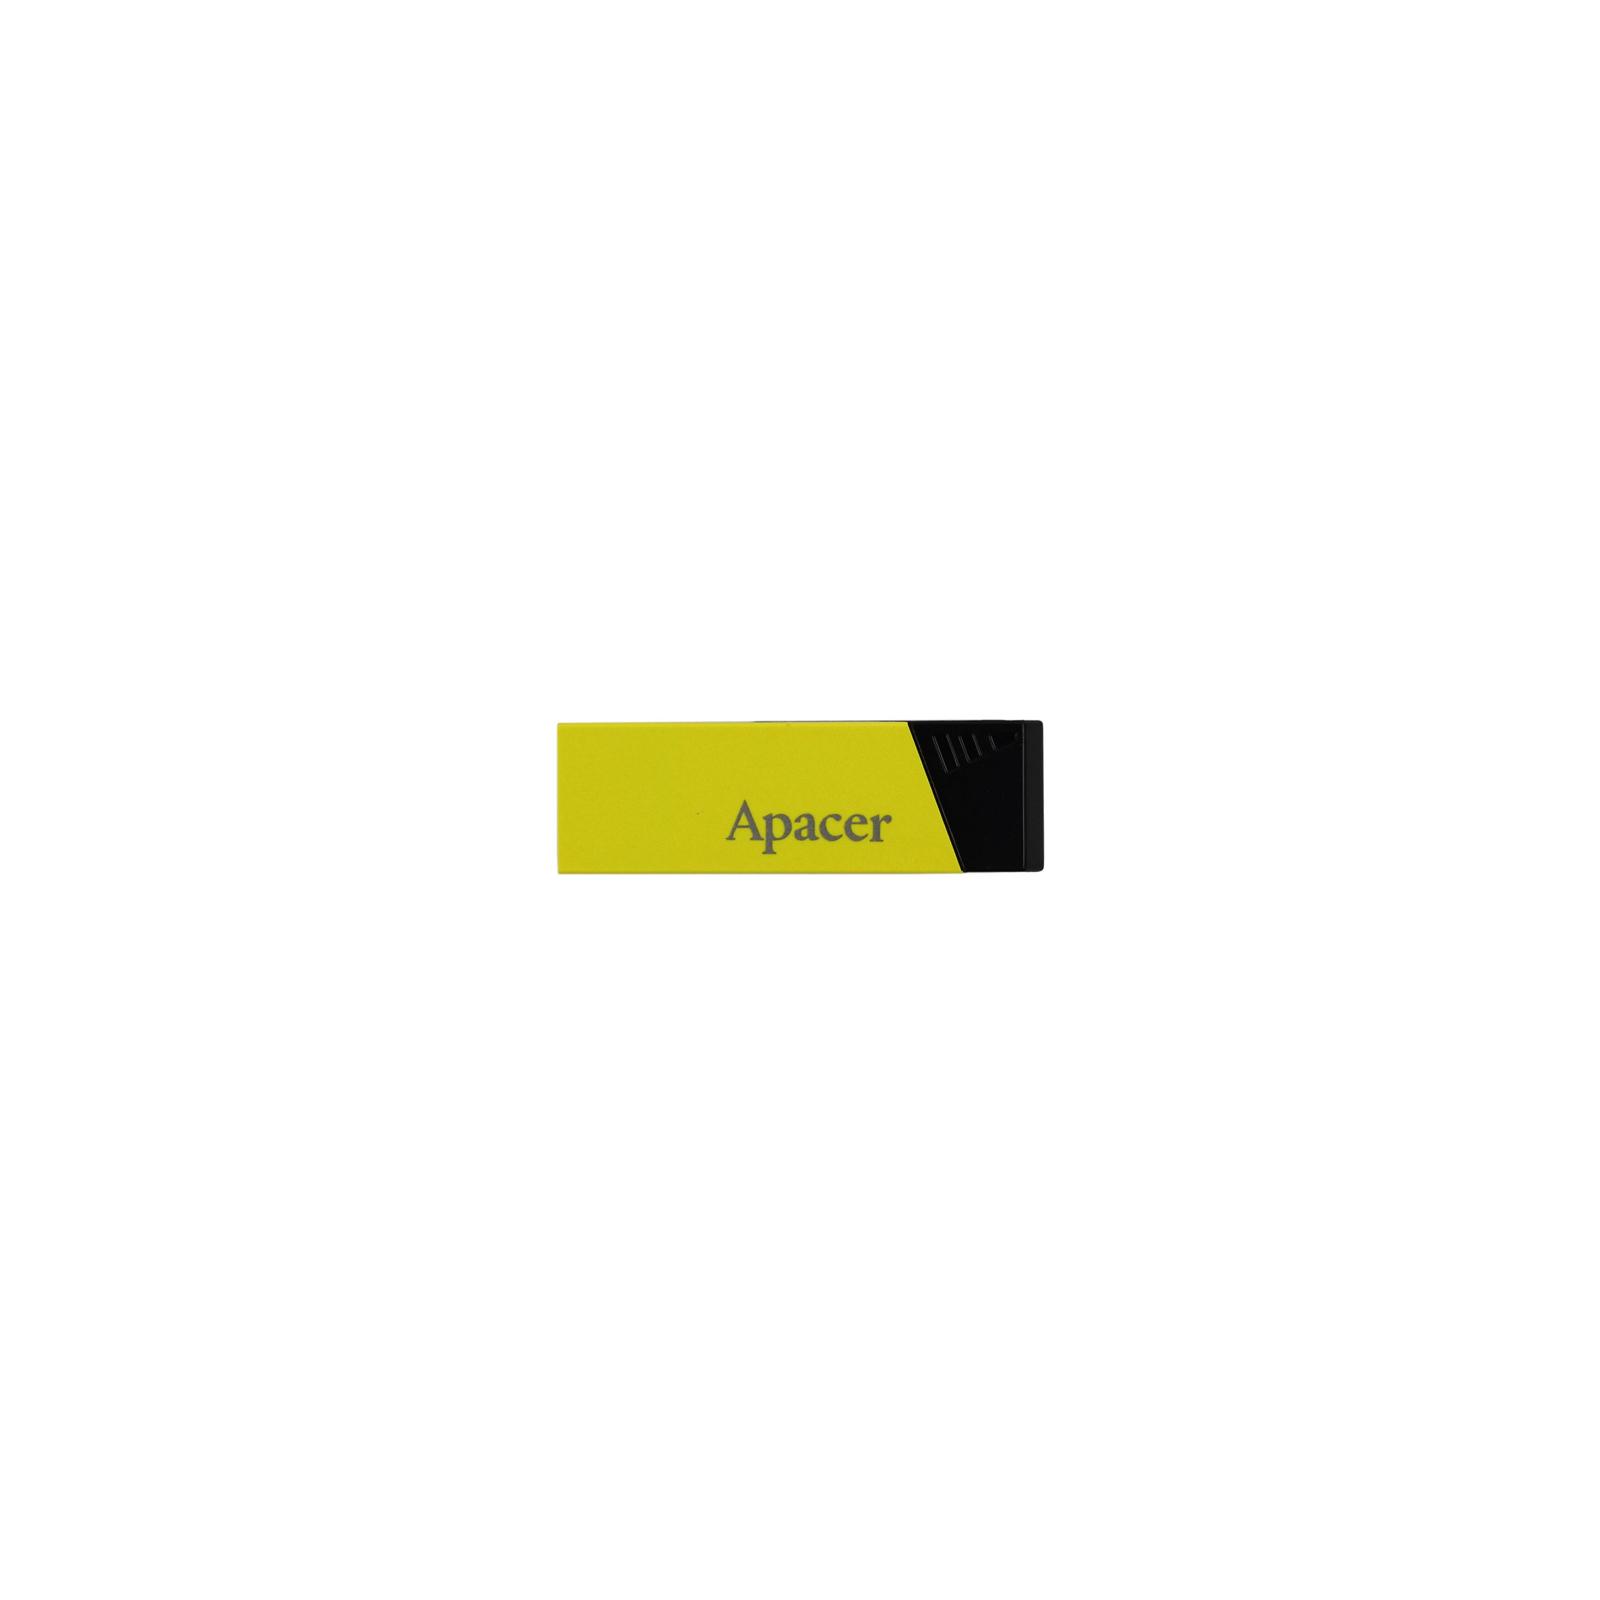 USB флеш накопитель 32GB AH131 Yellow RP USB2.0 Apacer (AP32GAH131Y-1)